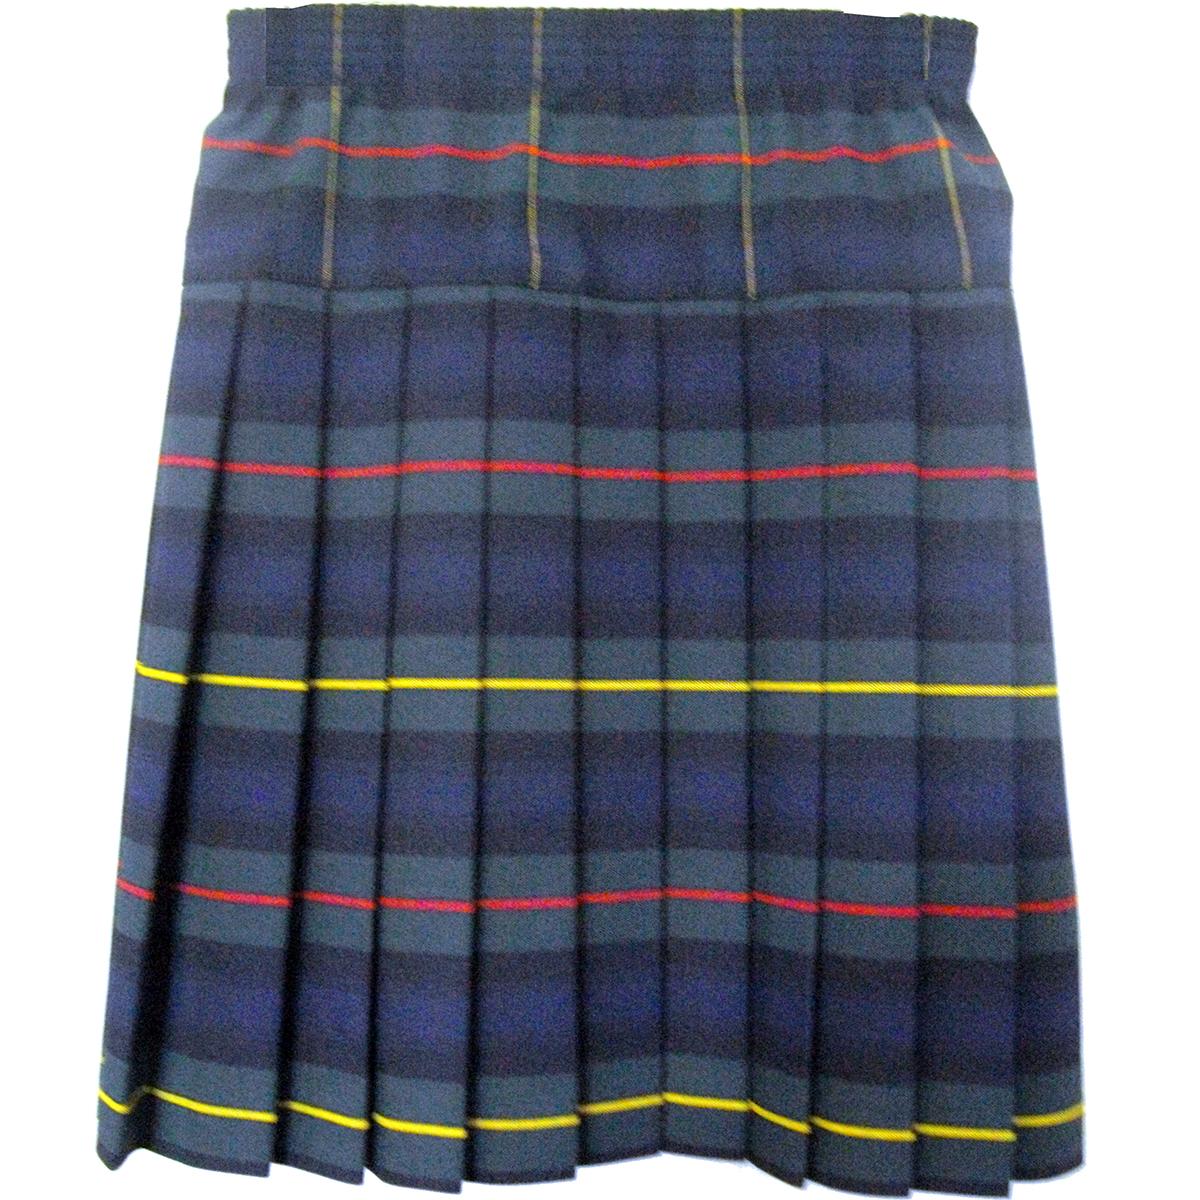 Girls School Uniform Yoke Pleated Skirt Plaid # 83 - Engelic Uniforms